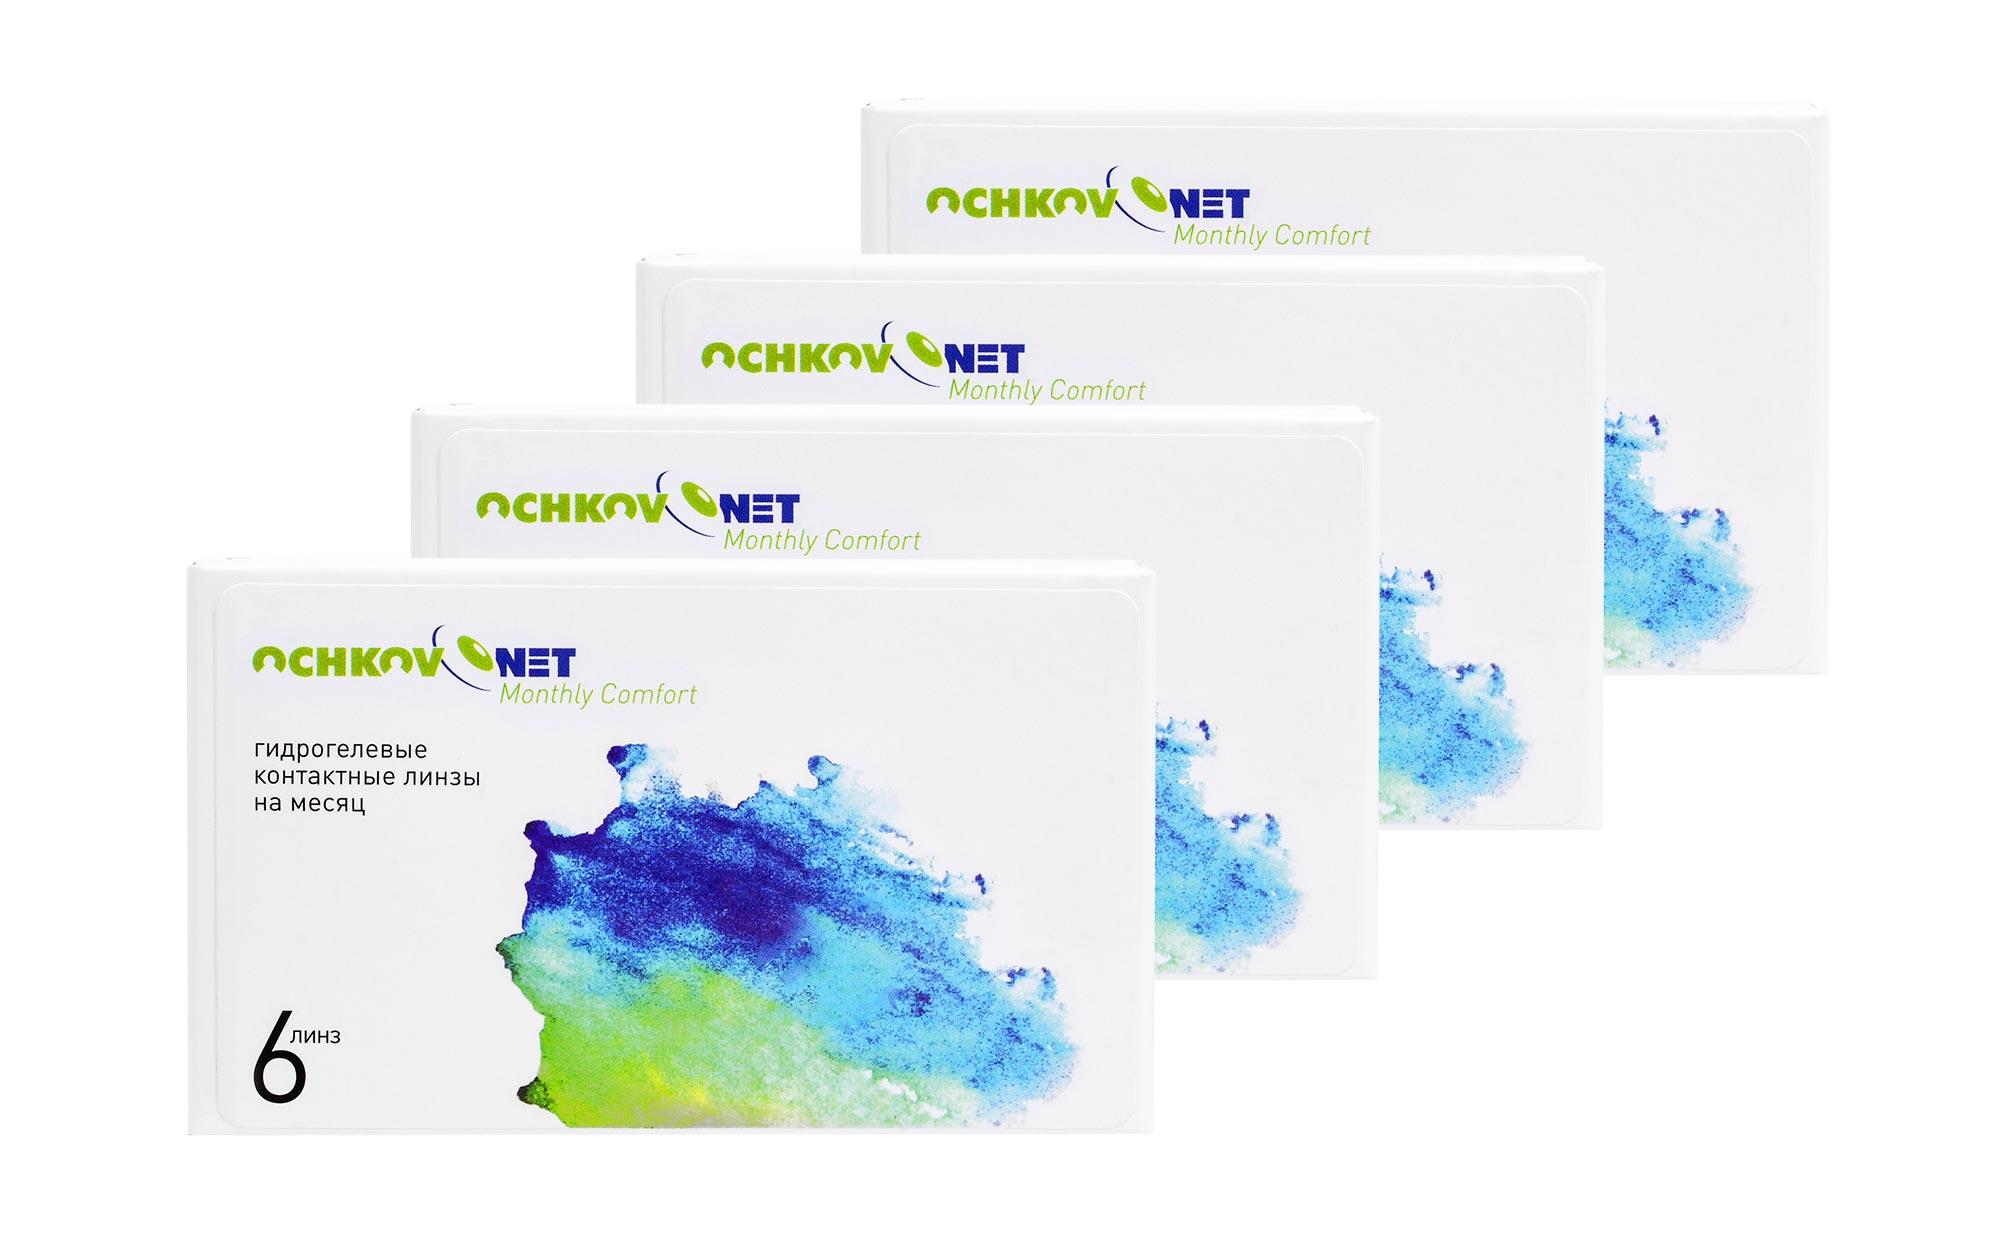 Контактные линзы Ochkov.Net Monthly Comfort (24 линзы)